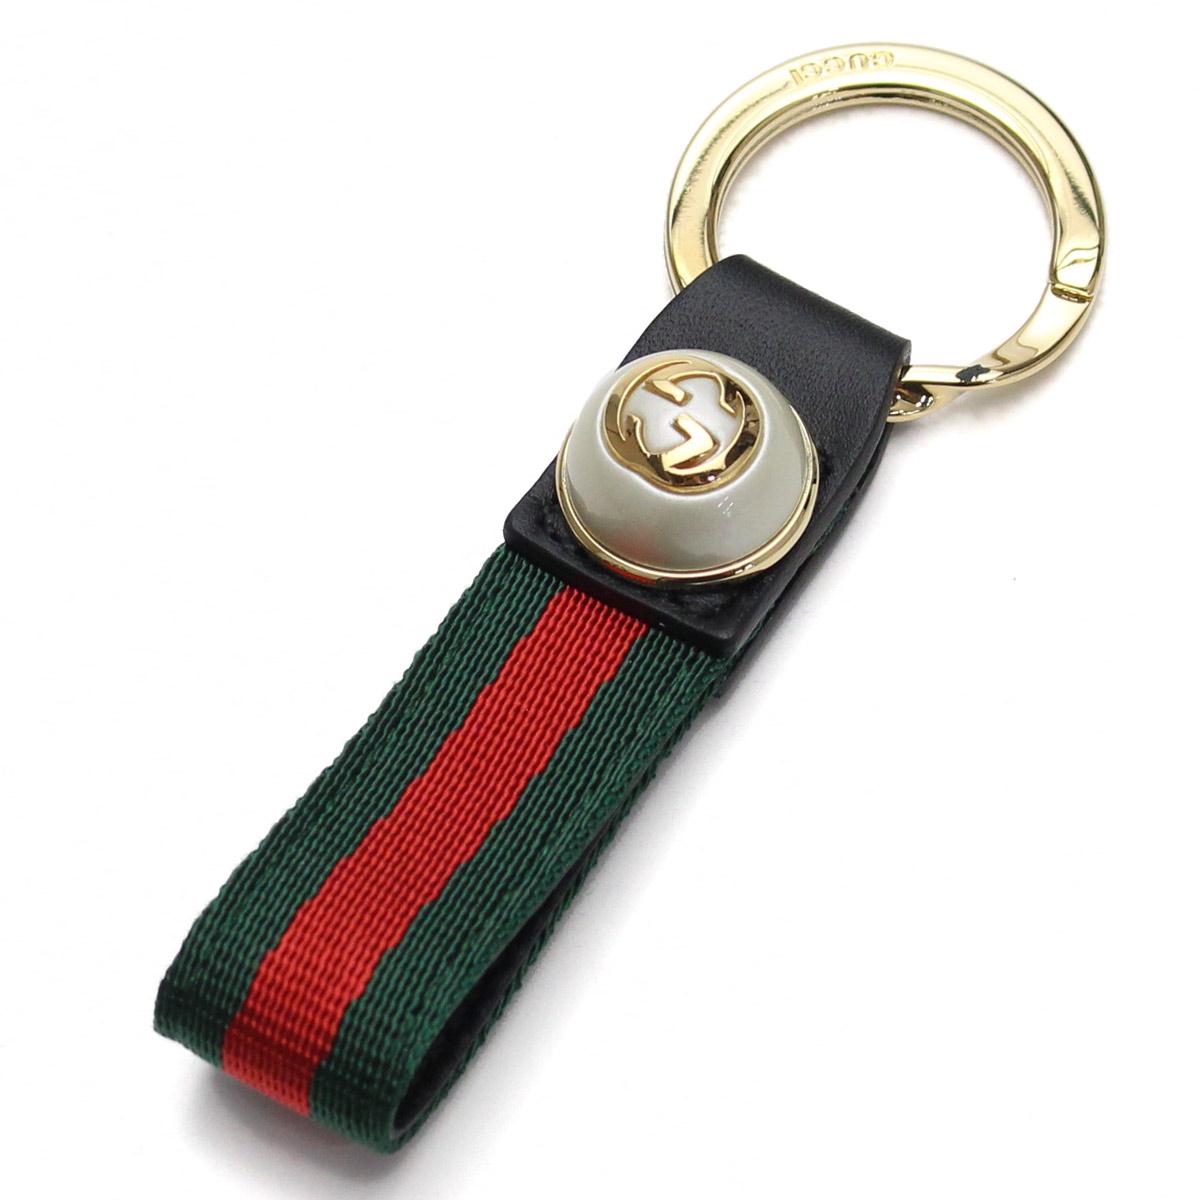 cadaaa1b011 Bighit The total brand wholesale  Gucci (GUCCI) GG pearl Web key ring  476390 H9VEG 8481 black green system